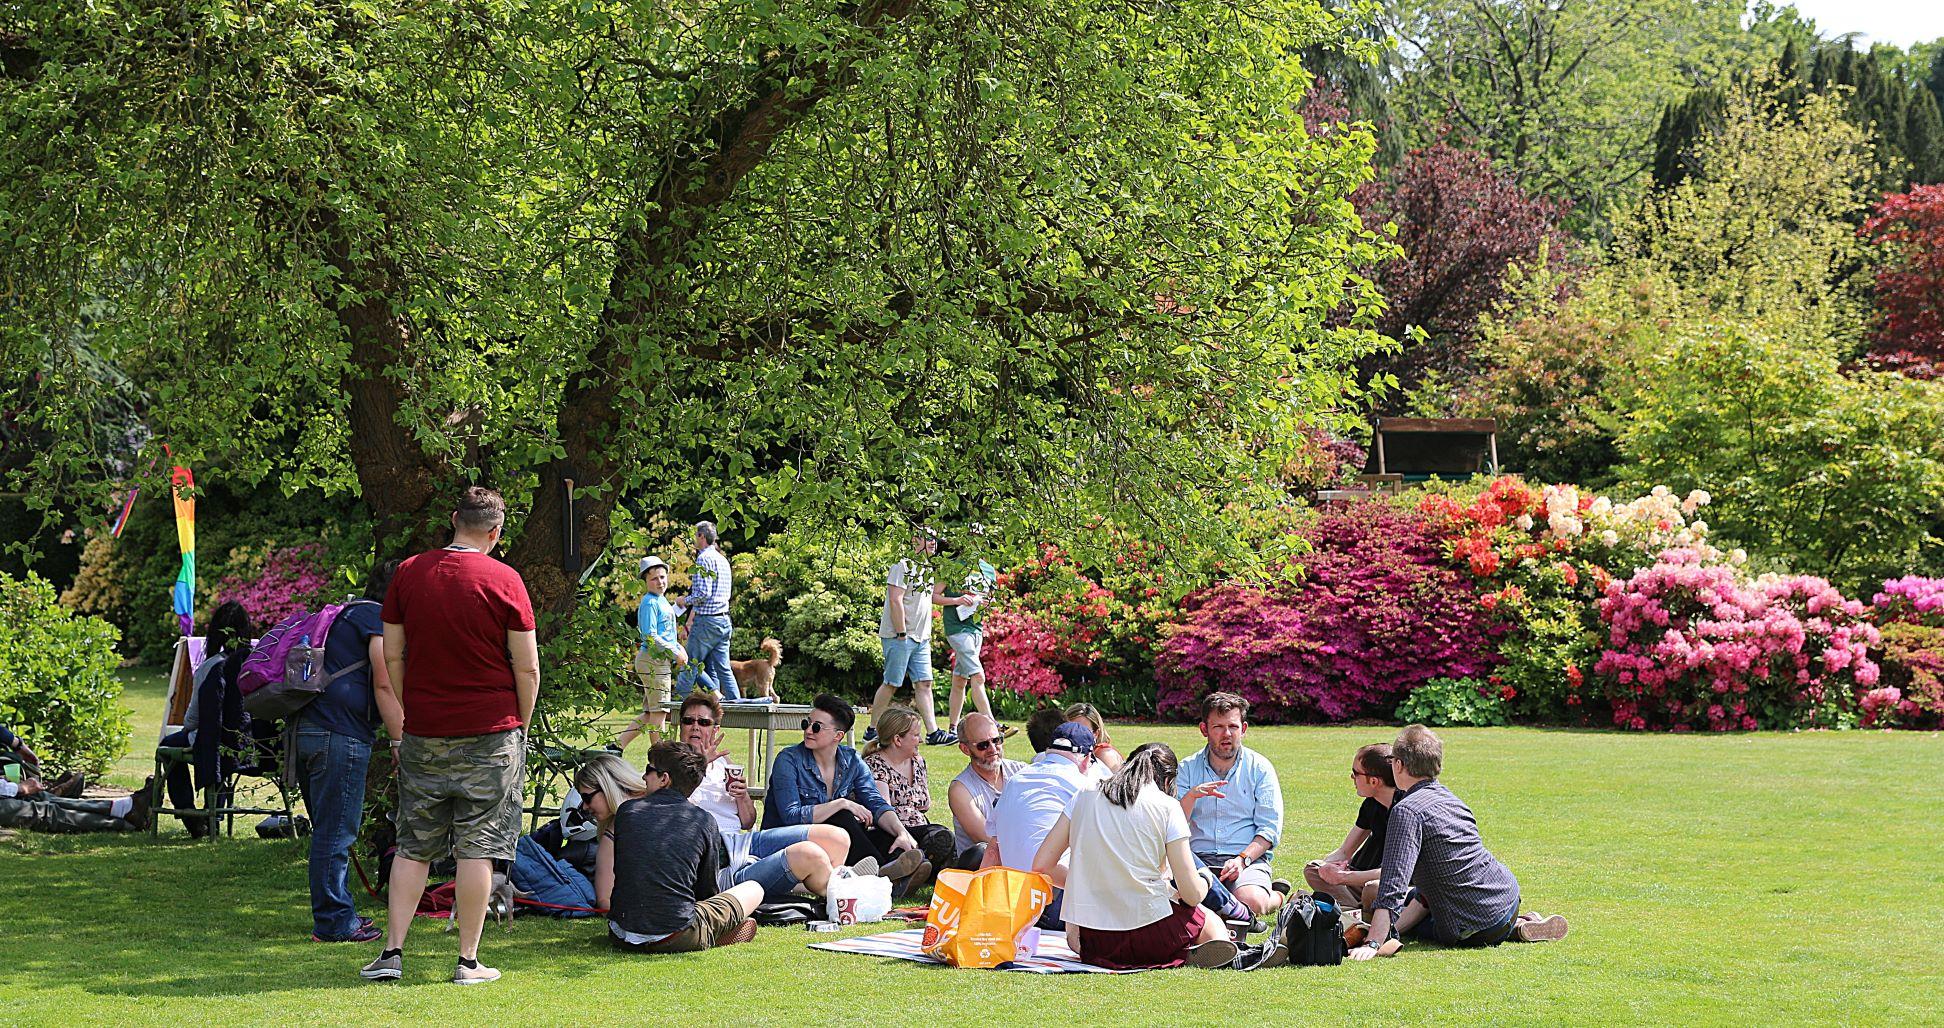 Alan Palmer_picnic on lawn_low res.jpg